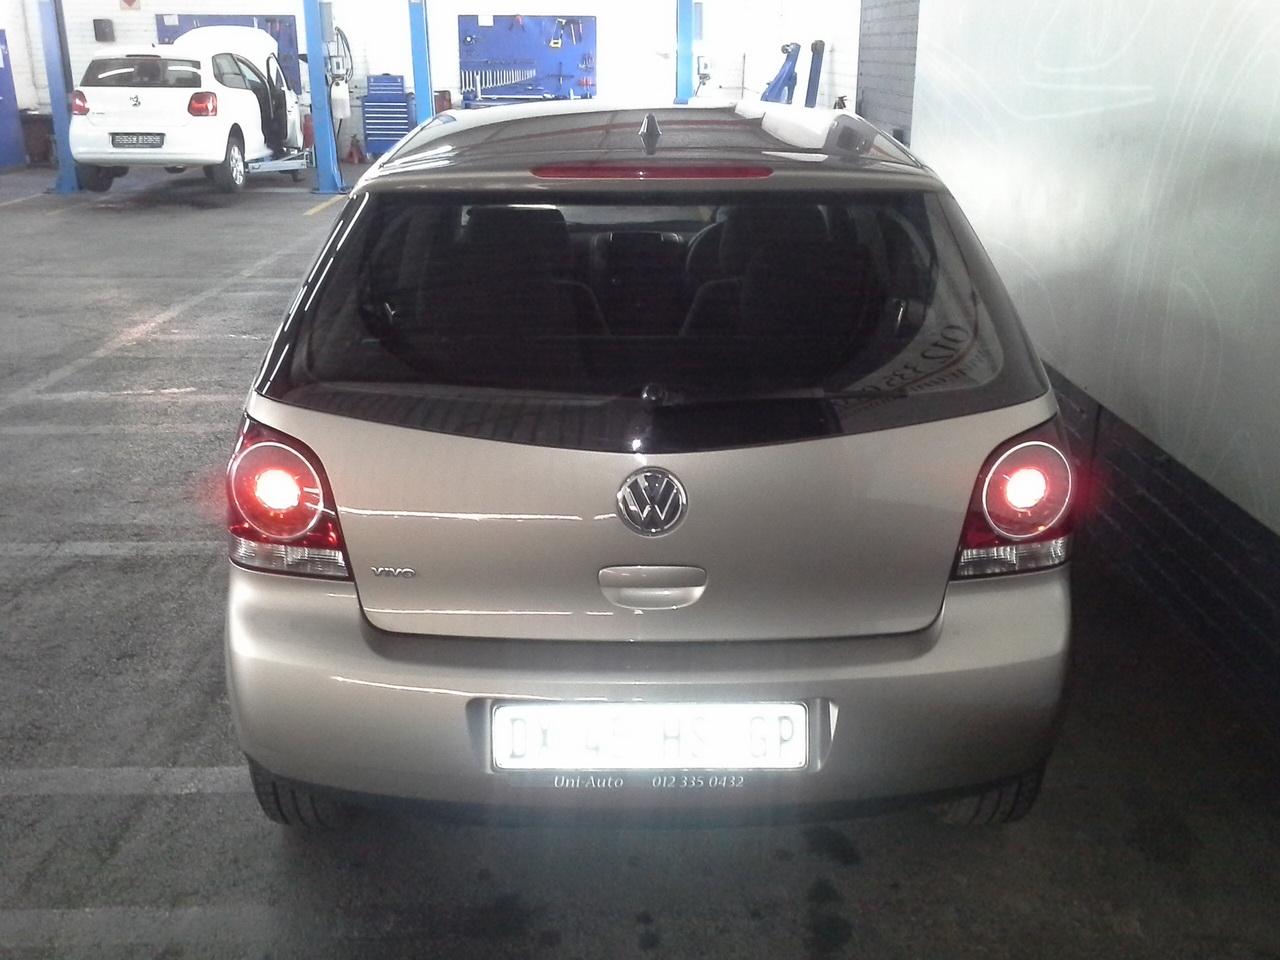 2015 VW Polo Vivo hatch 5-door POLO VIVO 1.4 COMFORTLINE (5DR)